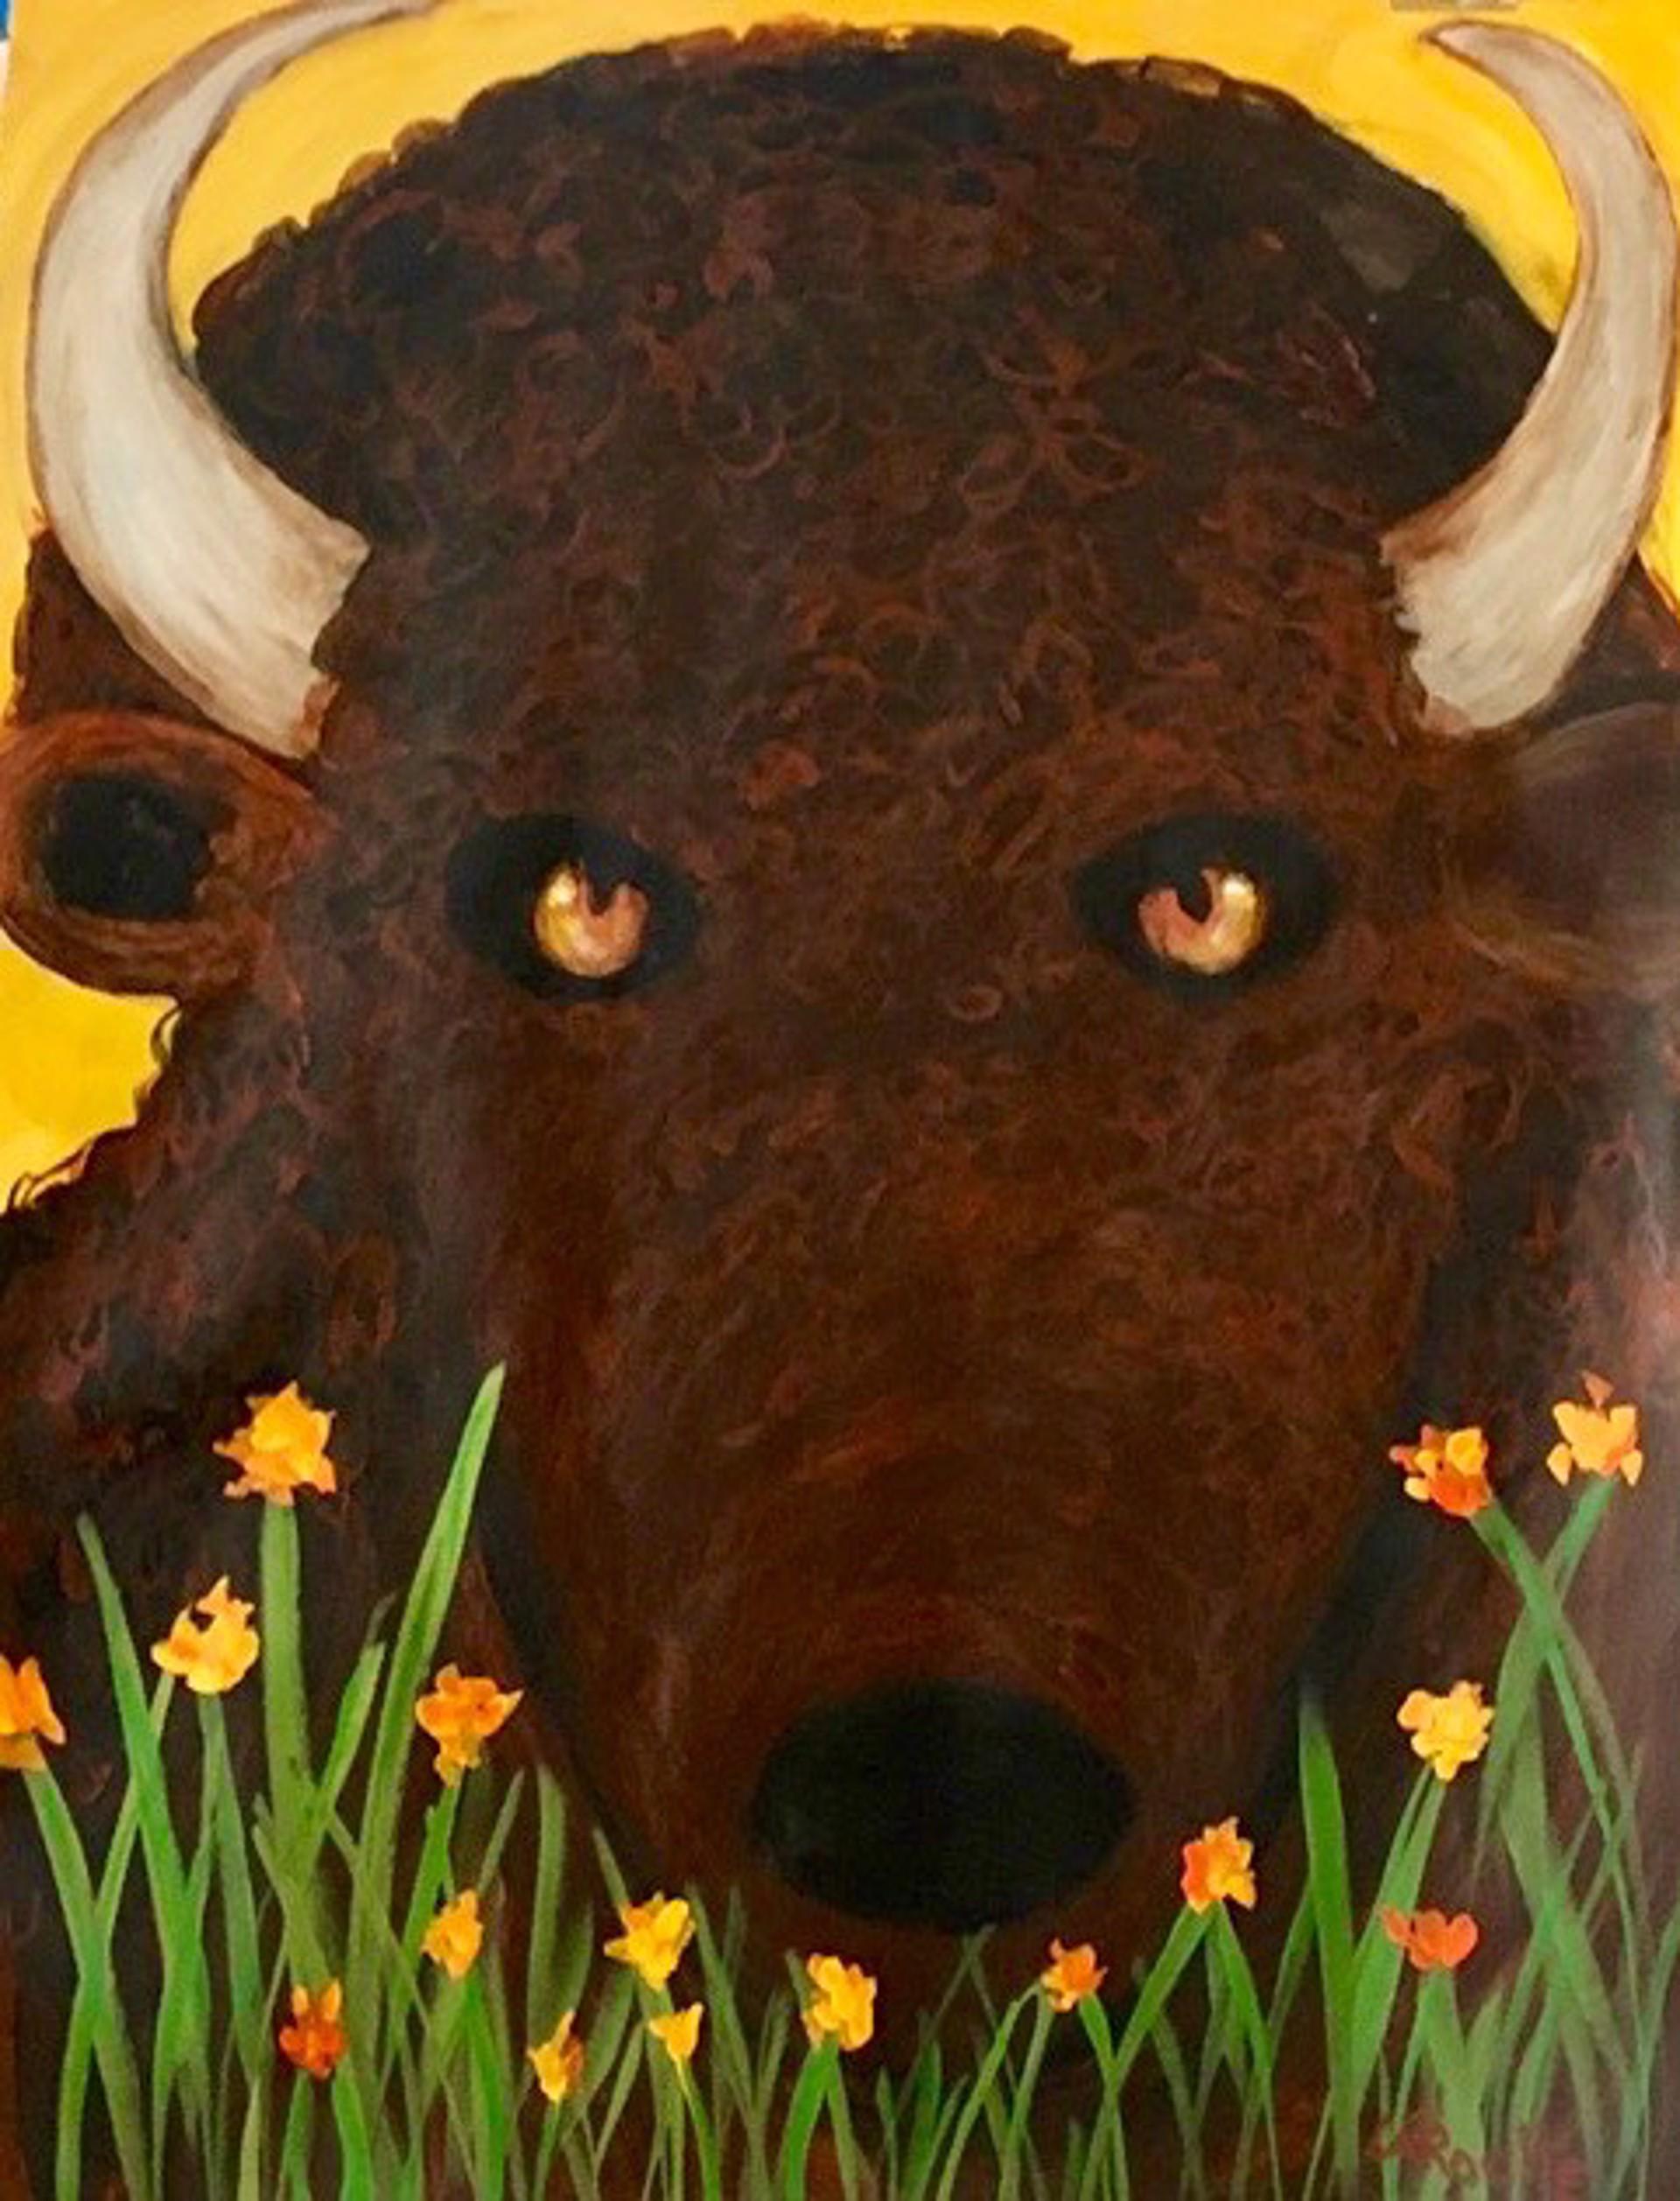 In the Garden: Brown Buffalo by Carole LaRoche